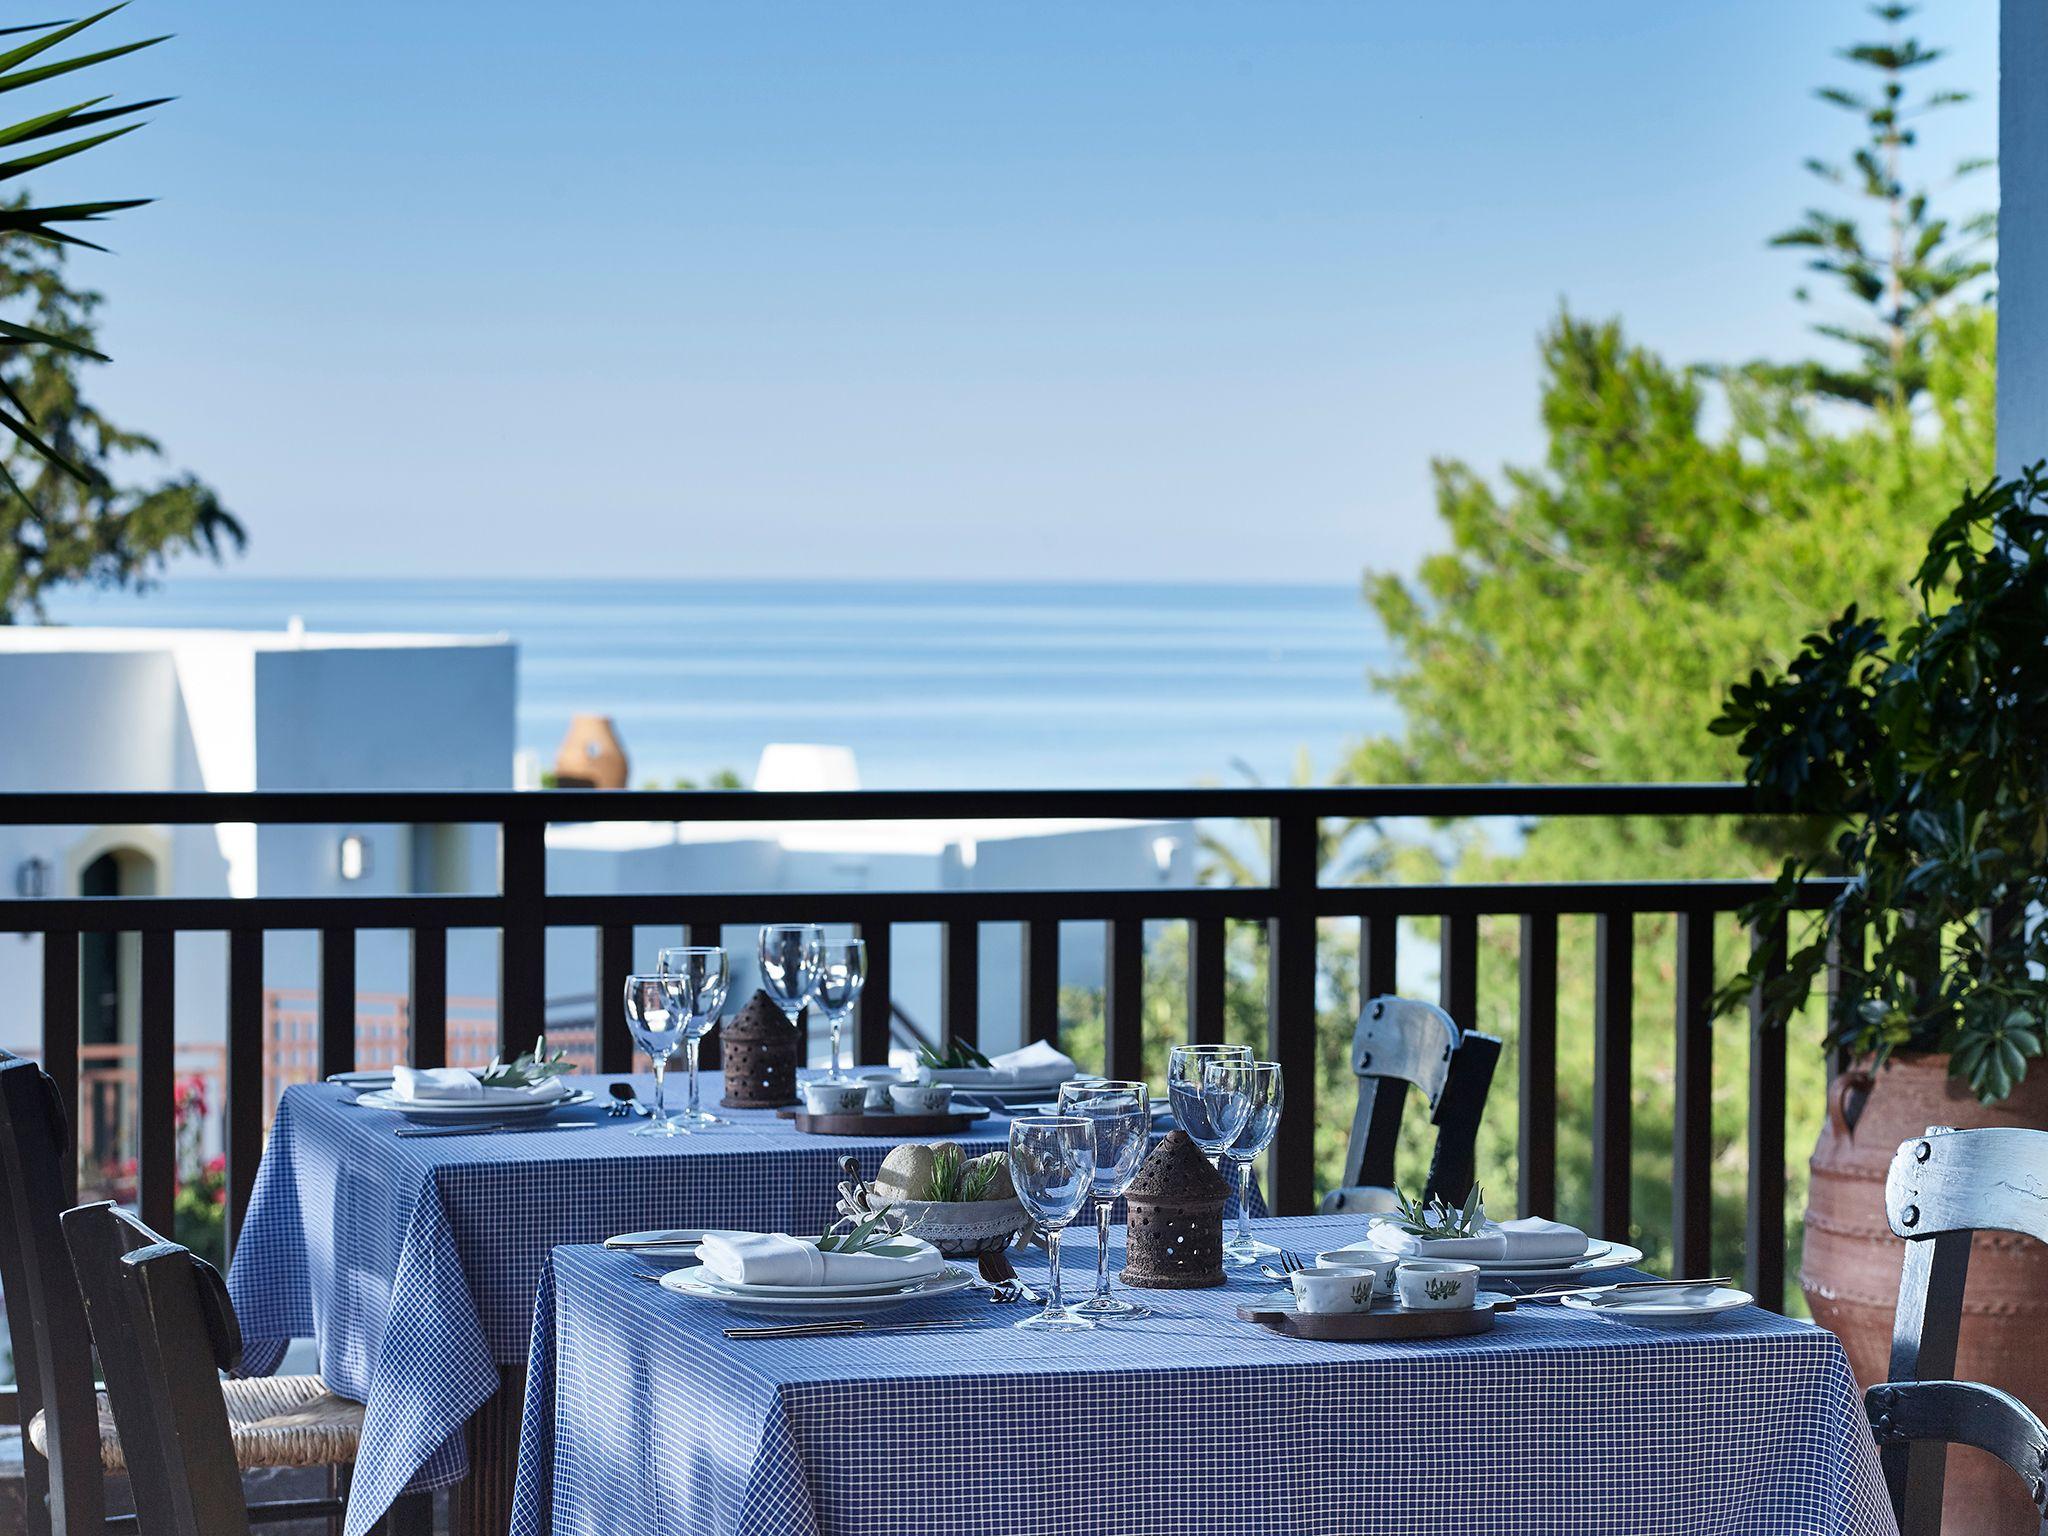 restauracja Pithos, hotel Creta Maris, Kreta